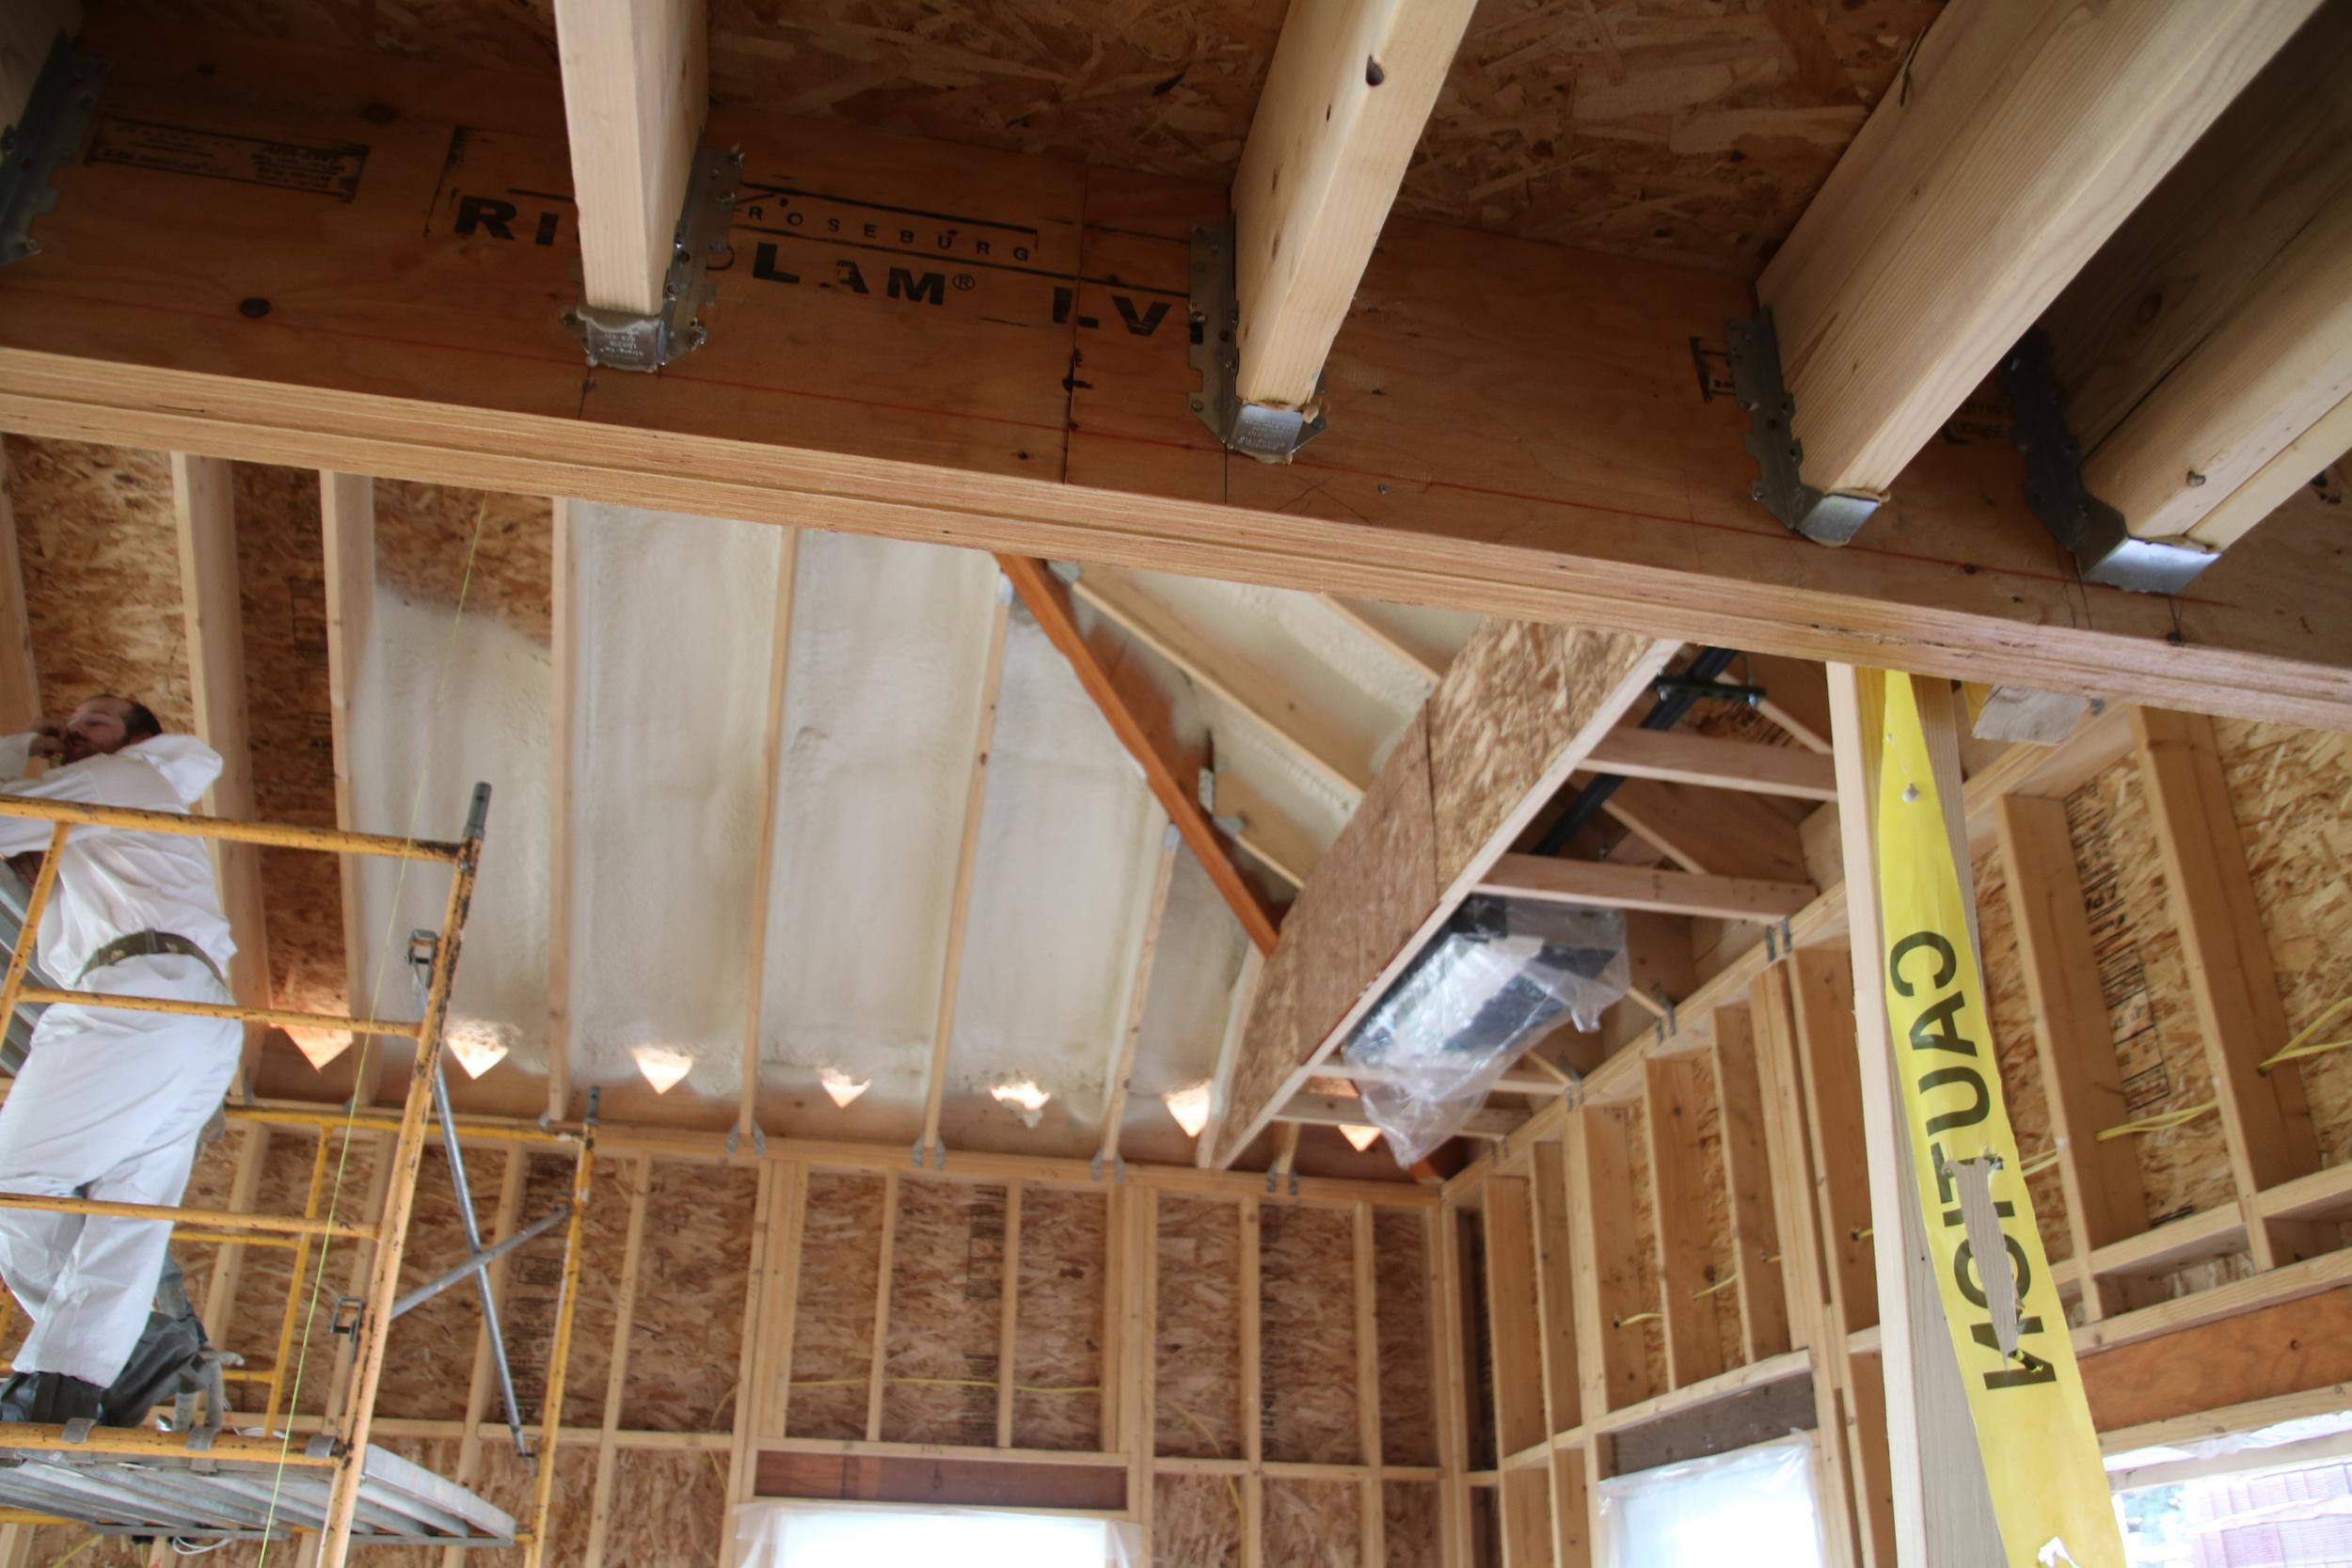 2015-10-29 foam roof insulation library.JPG